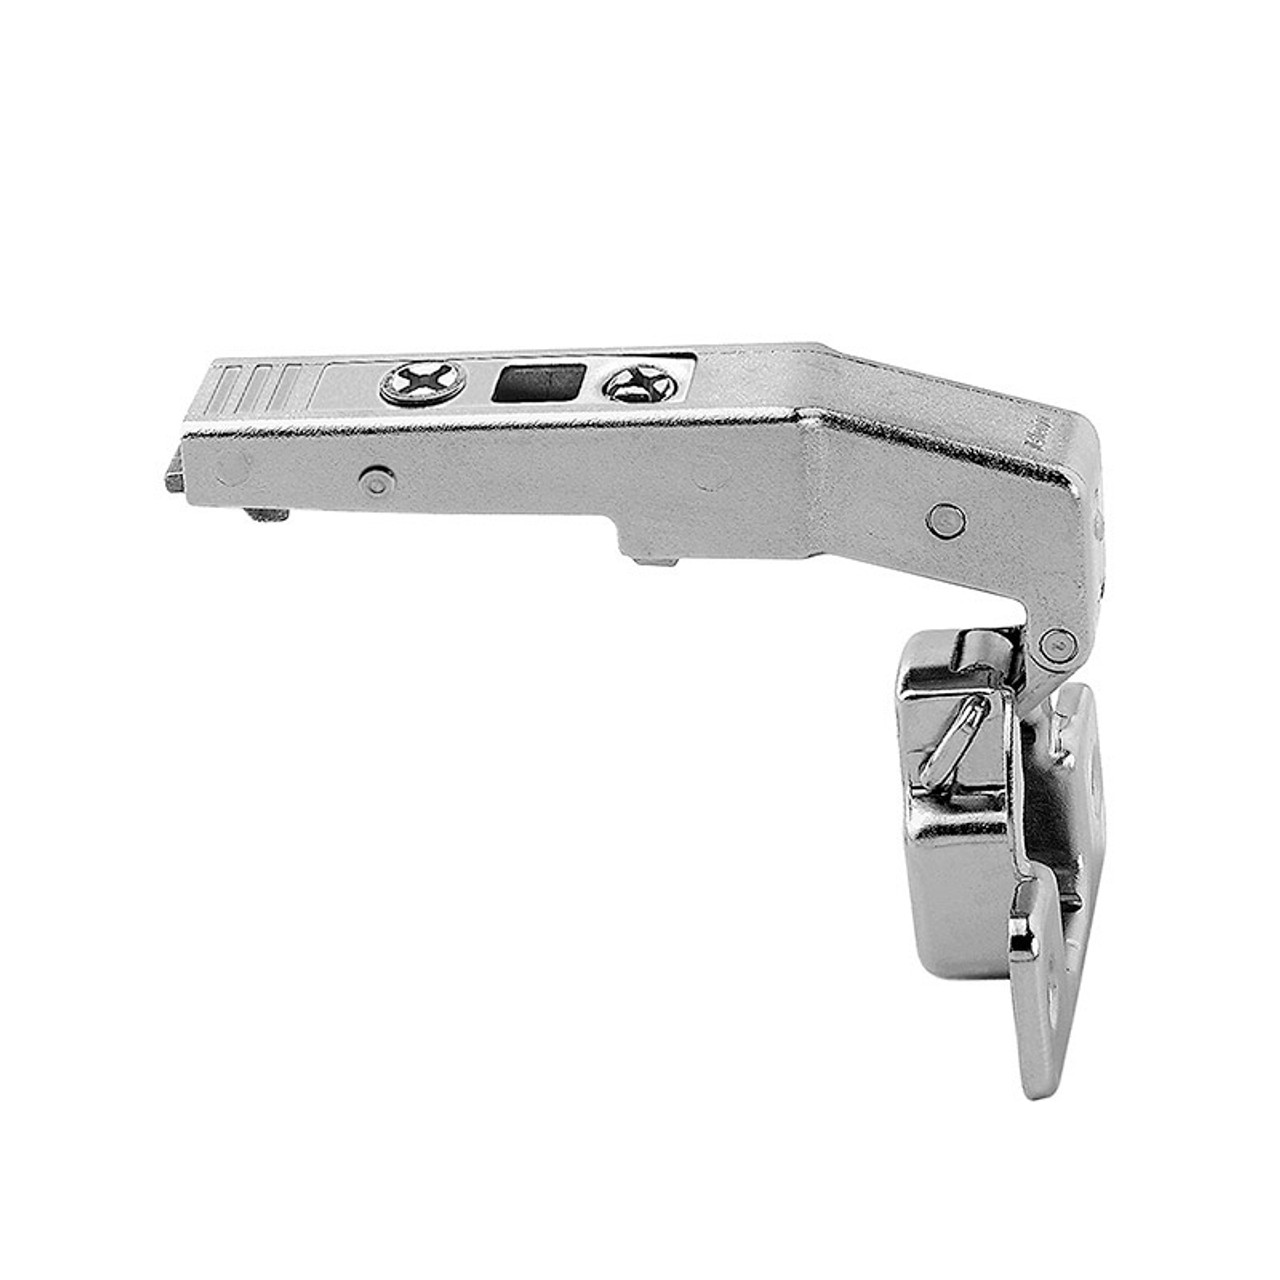 CLIP top Blind Corner Unsprung Screw-on Hinge - Inset